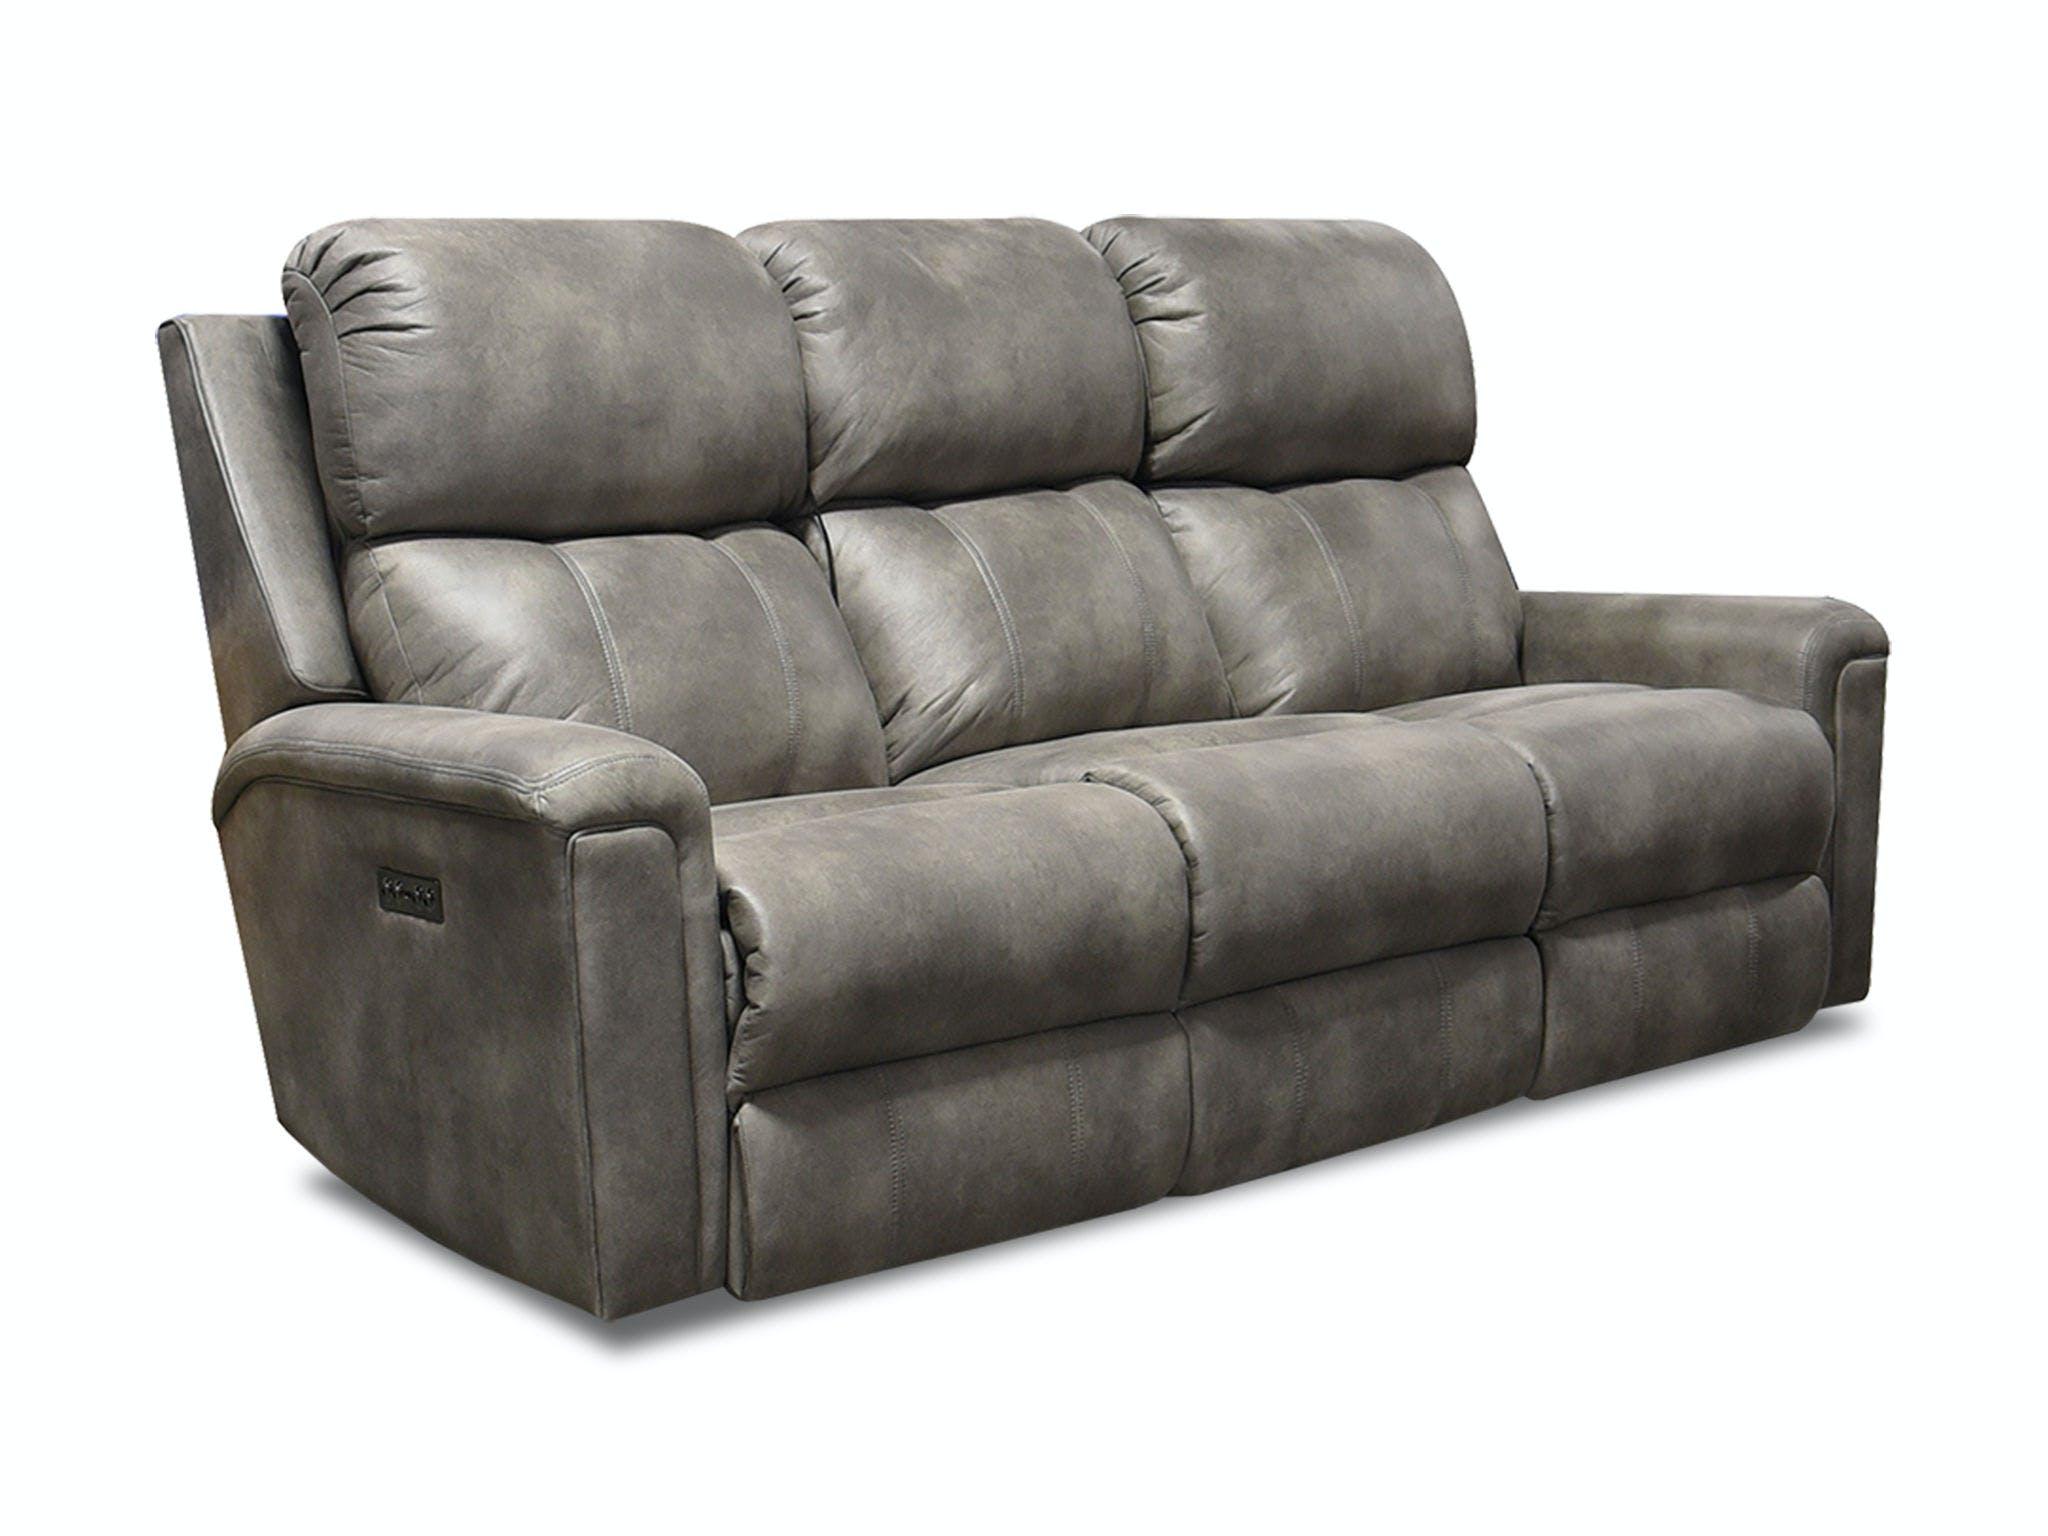 England Living Room Ez1c00 Double Reclining Sofa Ez1c01